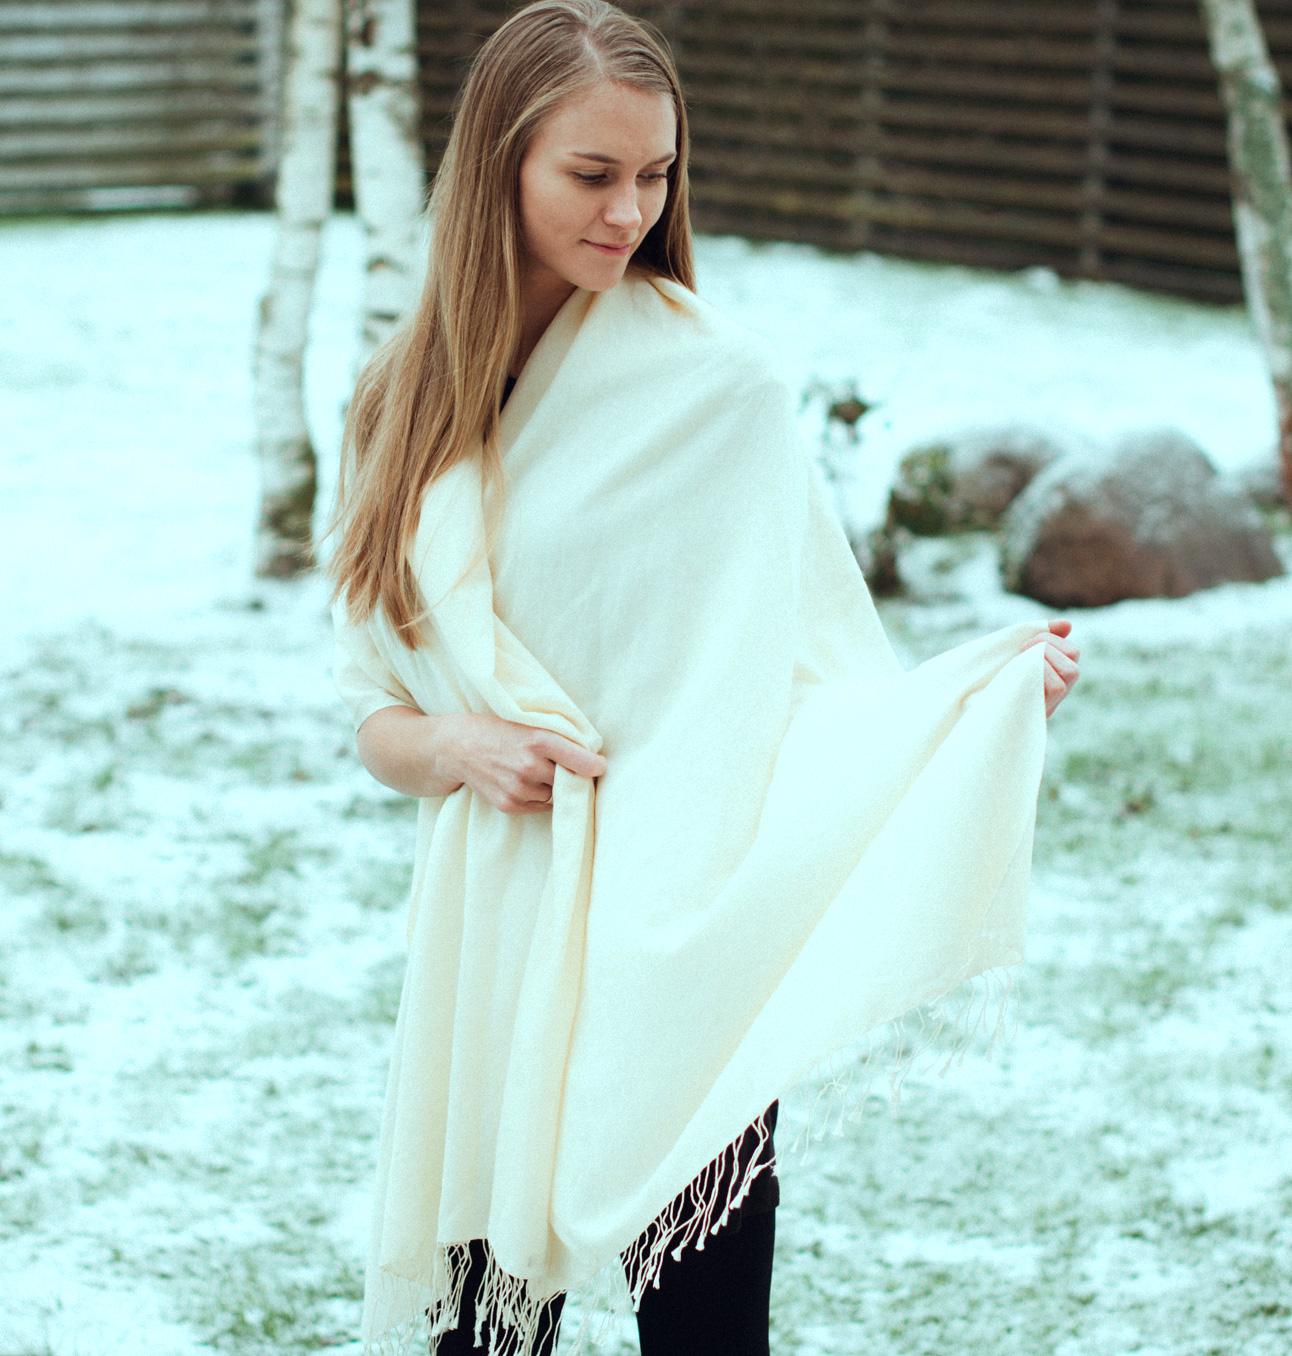 Pashmina Shawl - 90x200cm - 70% Cashmere / 30% Silk - Bellini